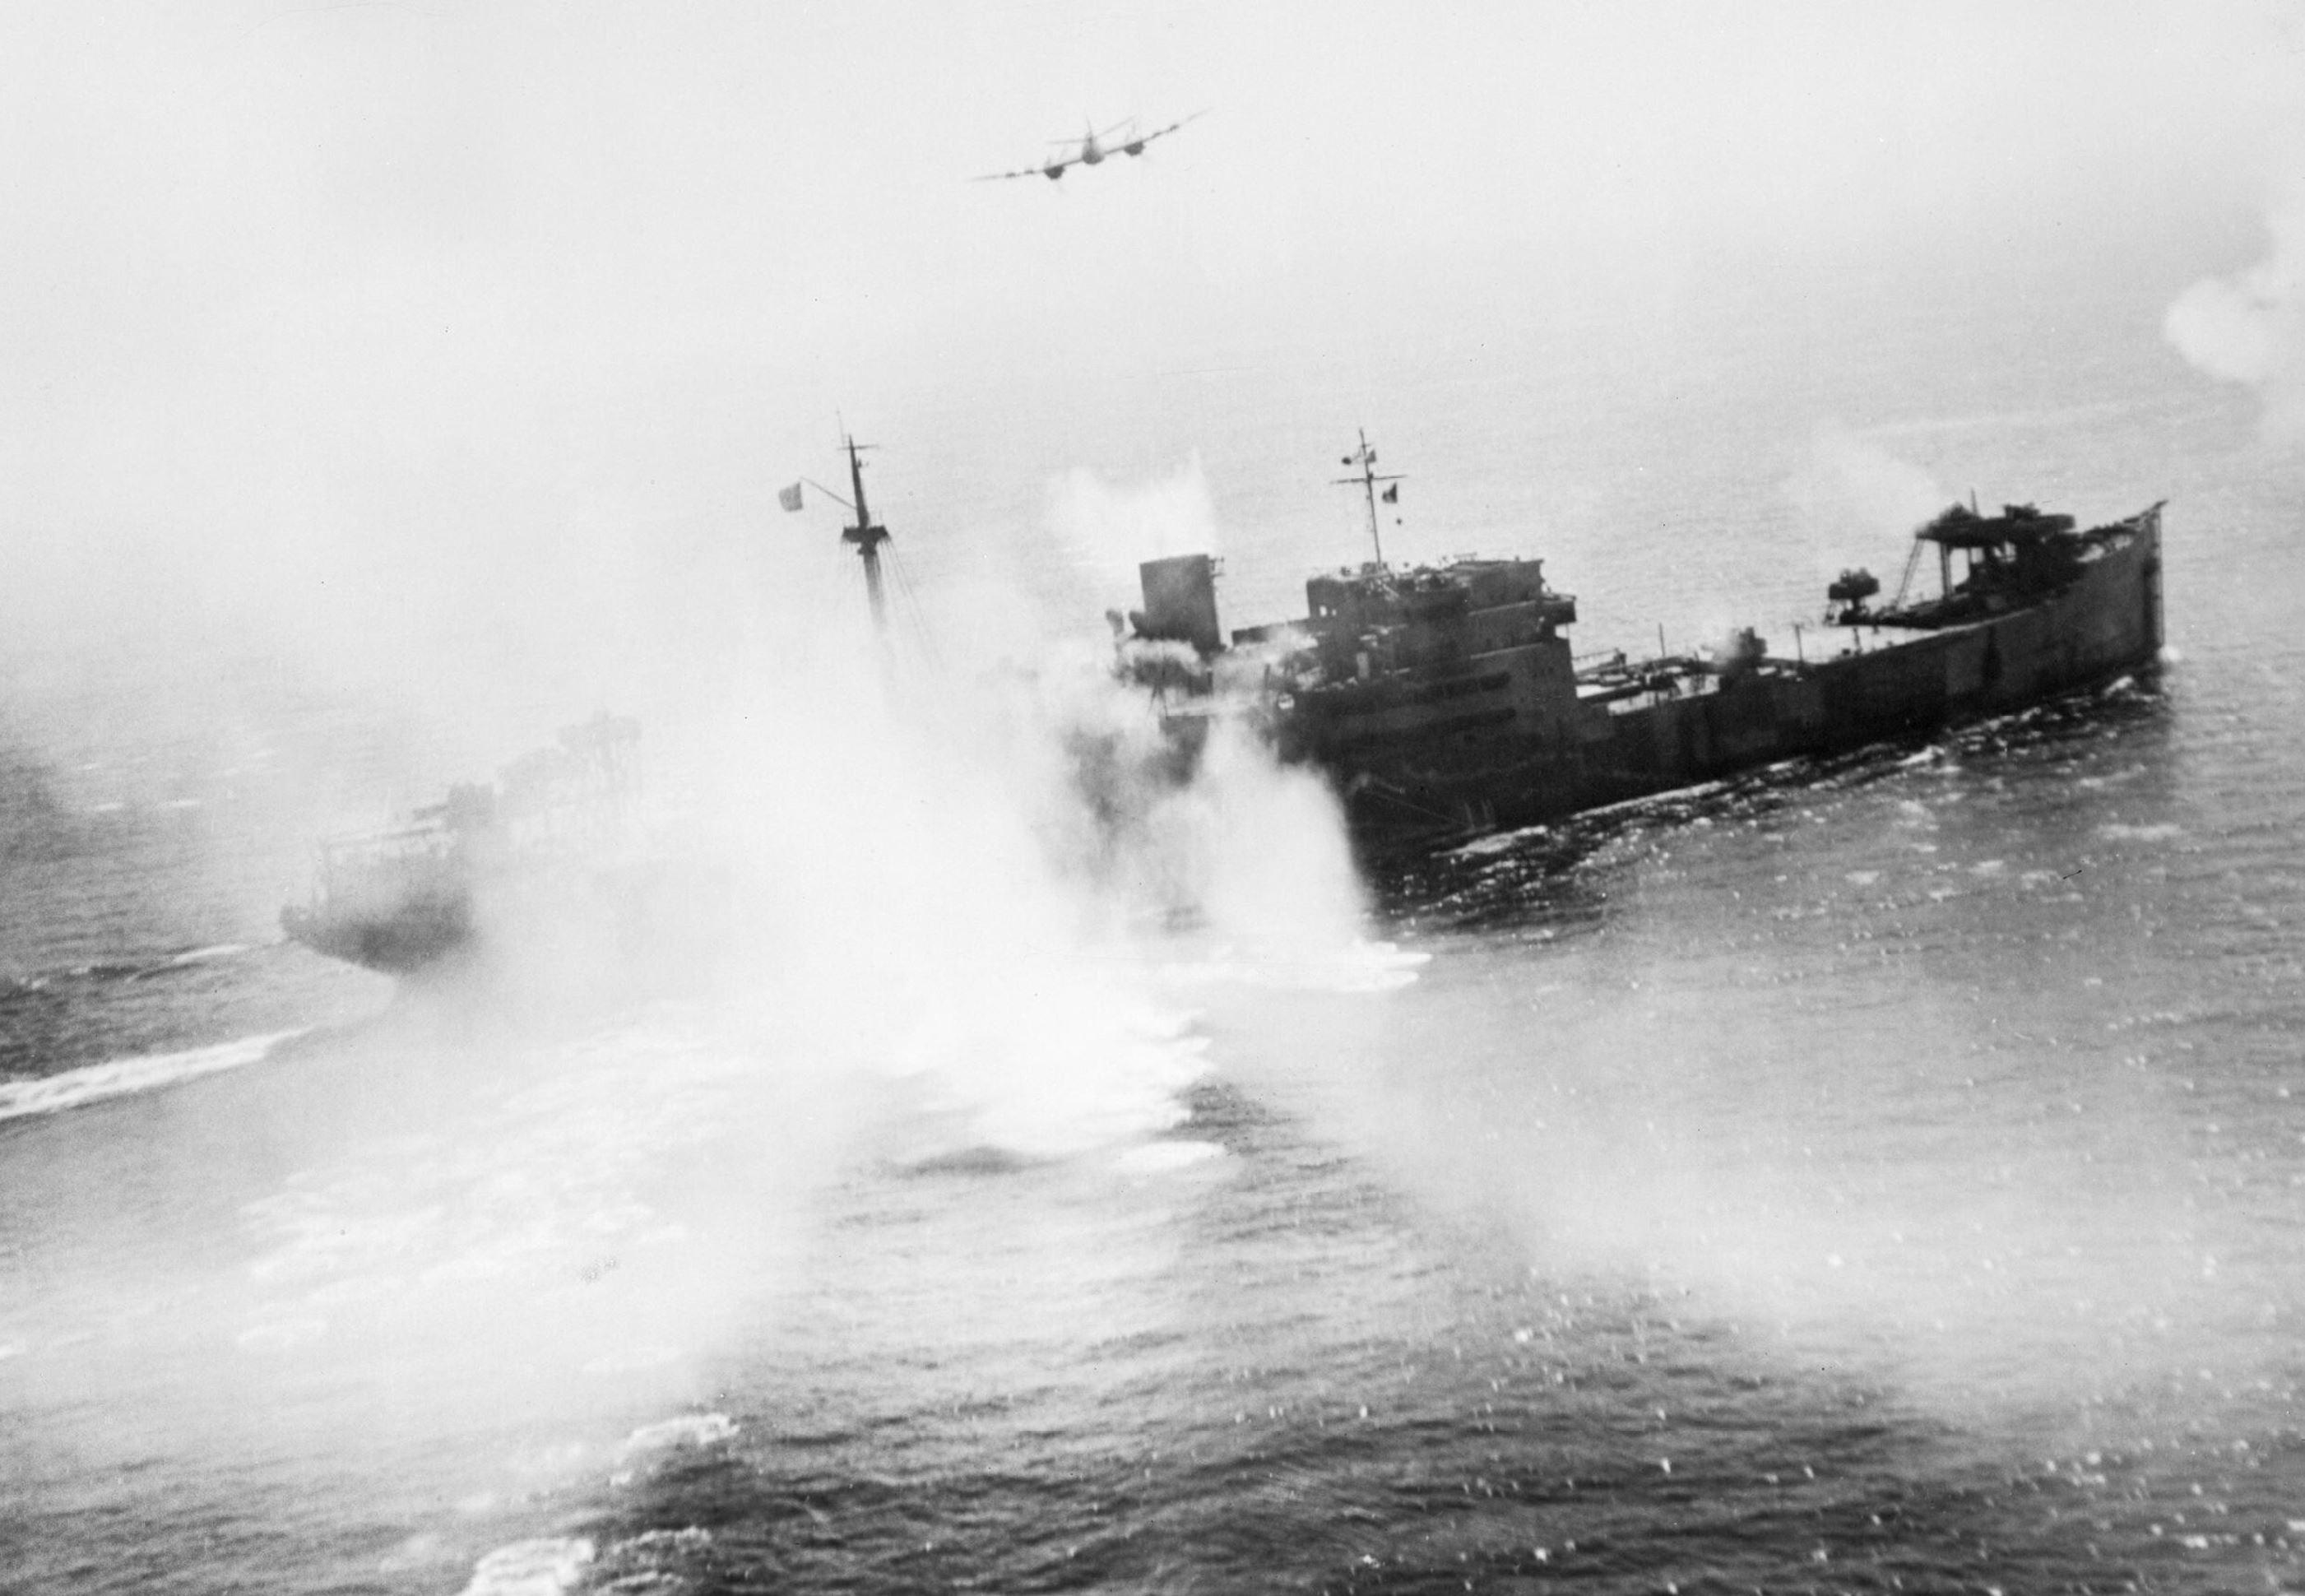 Beaufighter TFX RAF 236Sqn severly crippled the Sauerland off La Pallice 12 Aug 1944 IWM C4546